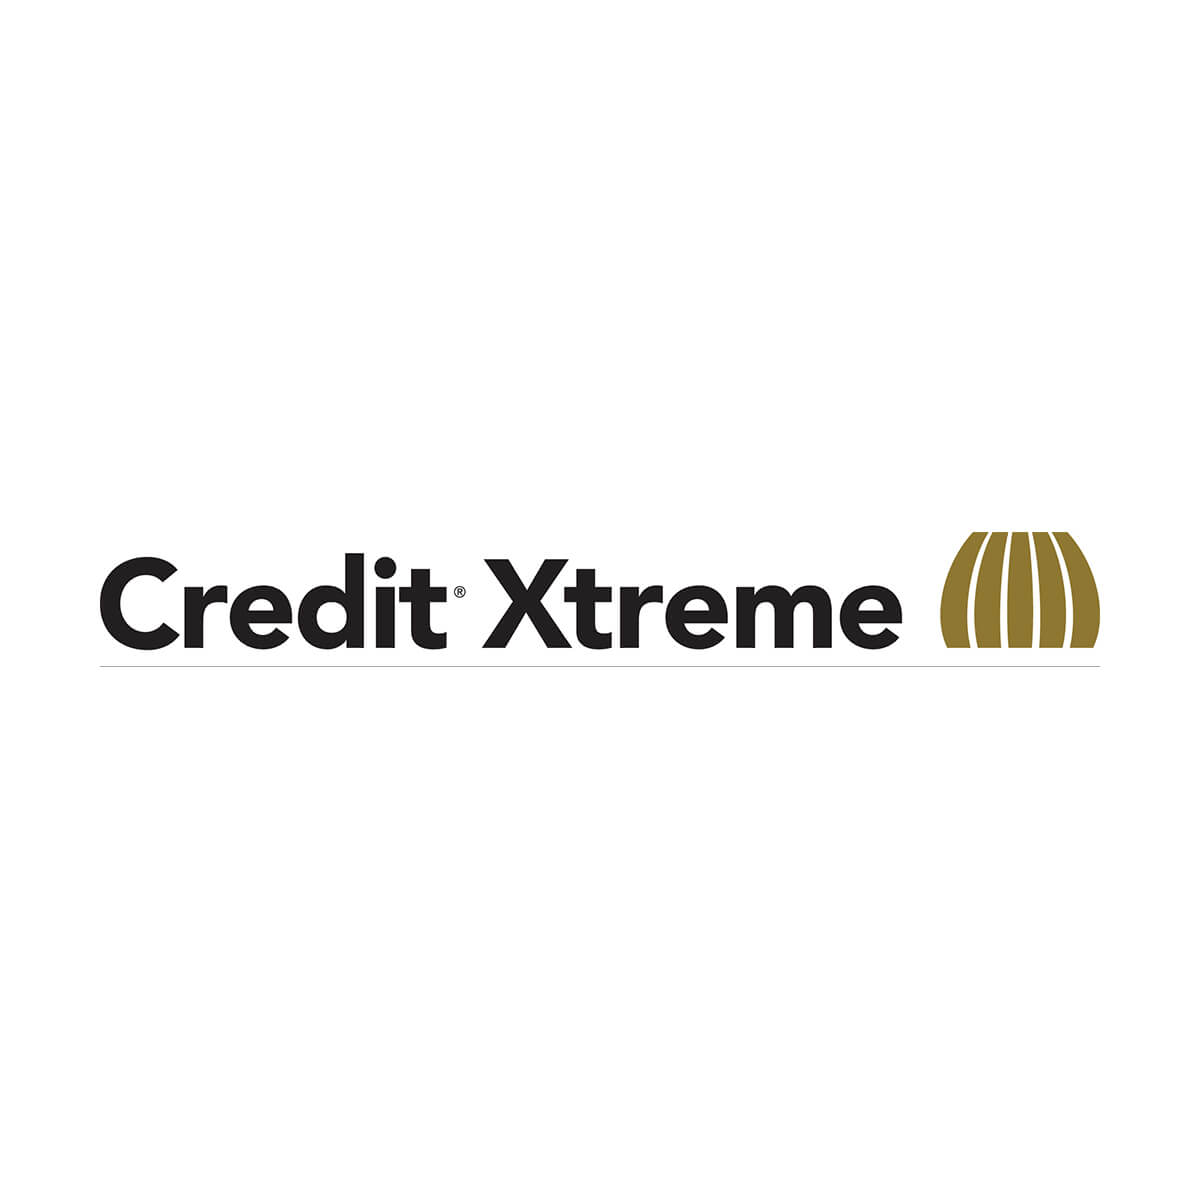 Credit® Xtreme - 500 L Tote